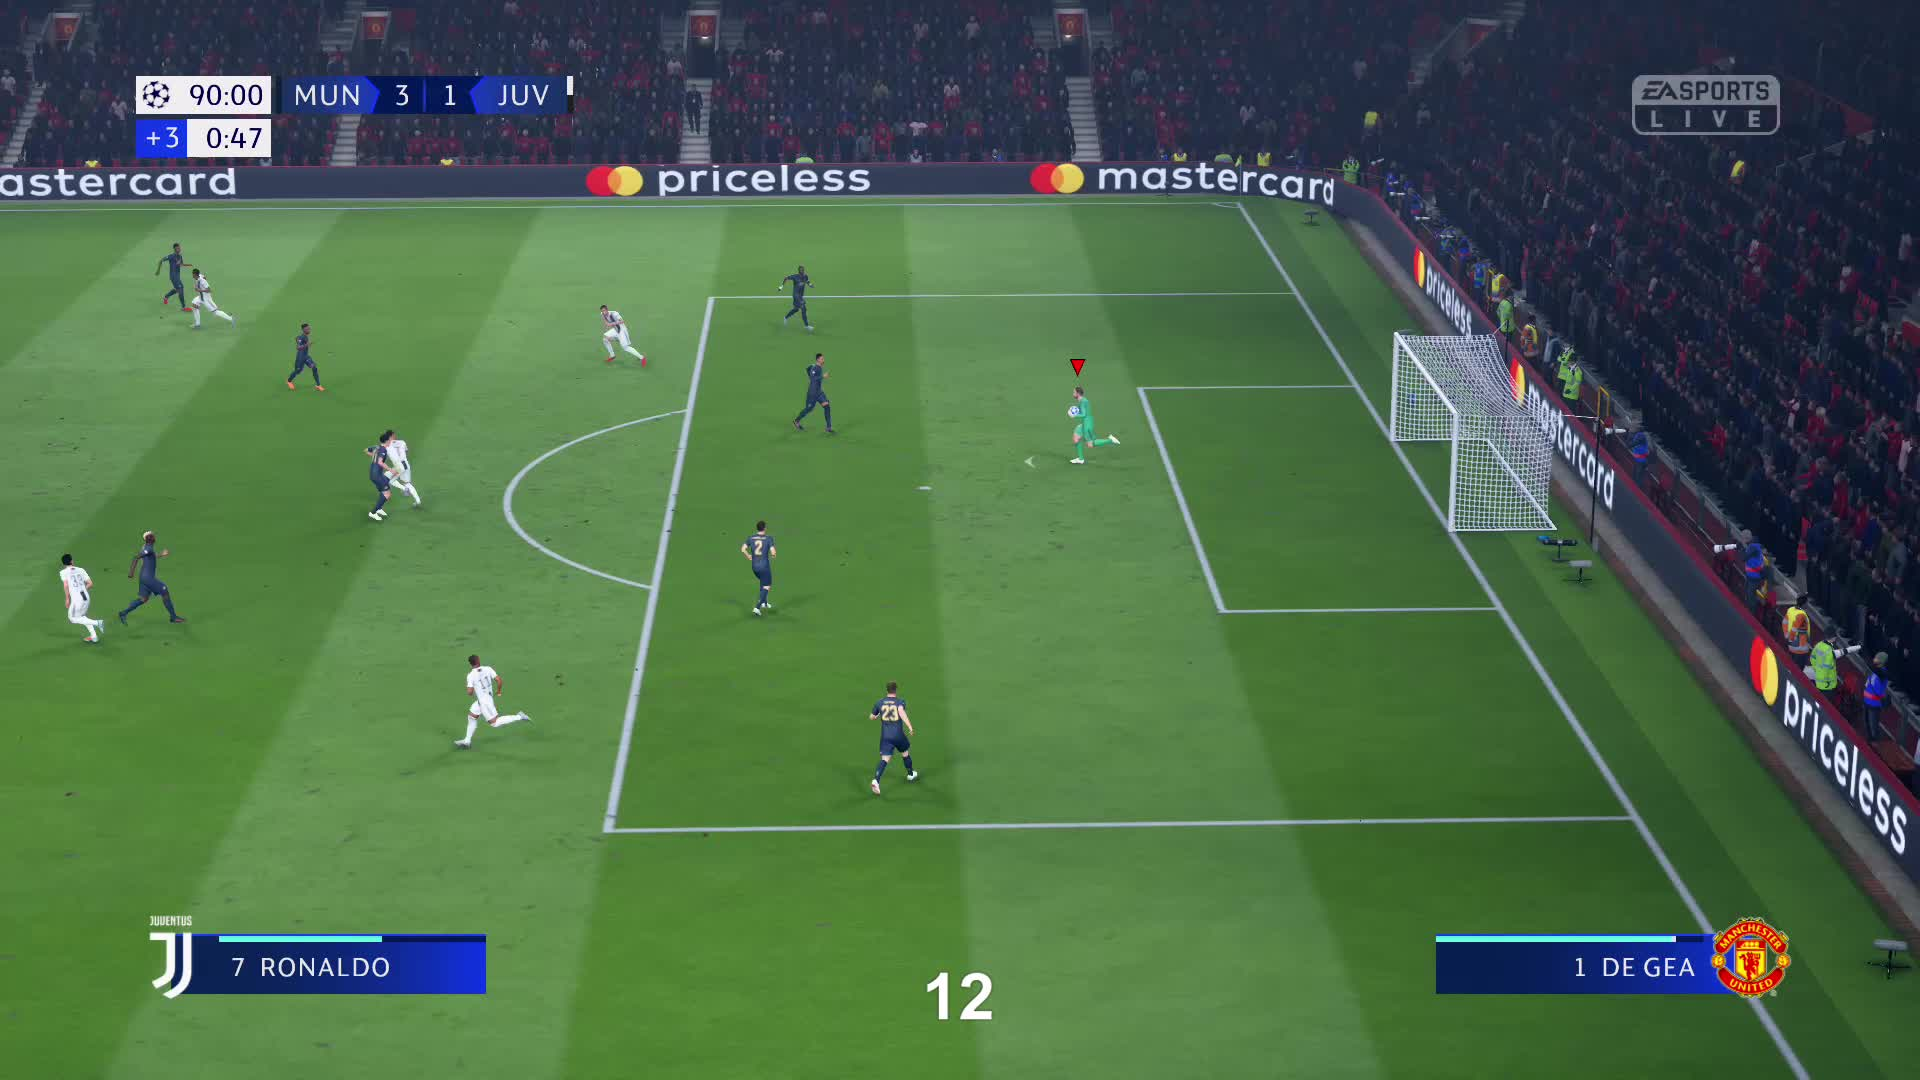 FIFA19, Ivanss77, fifa19, goal, goals, ivanss77, xbox, xbox dvr, xbox one, GOAL GIFs